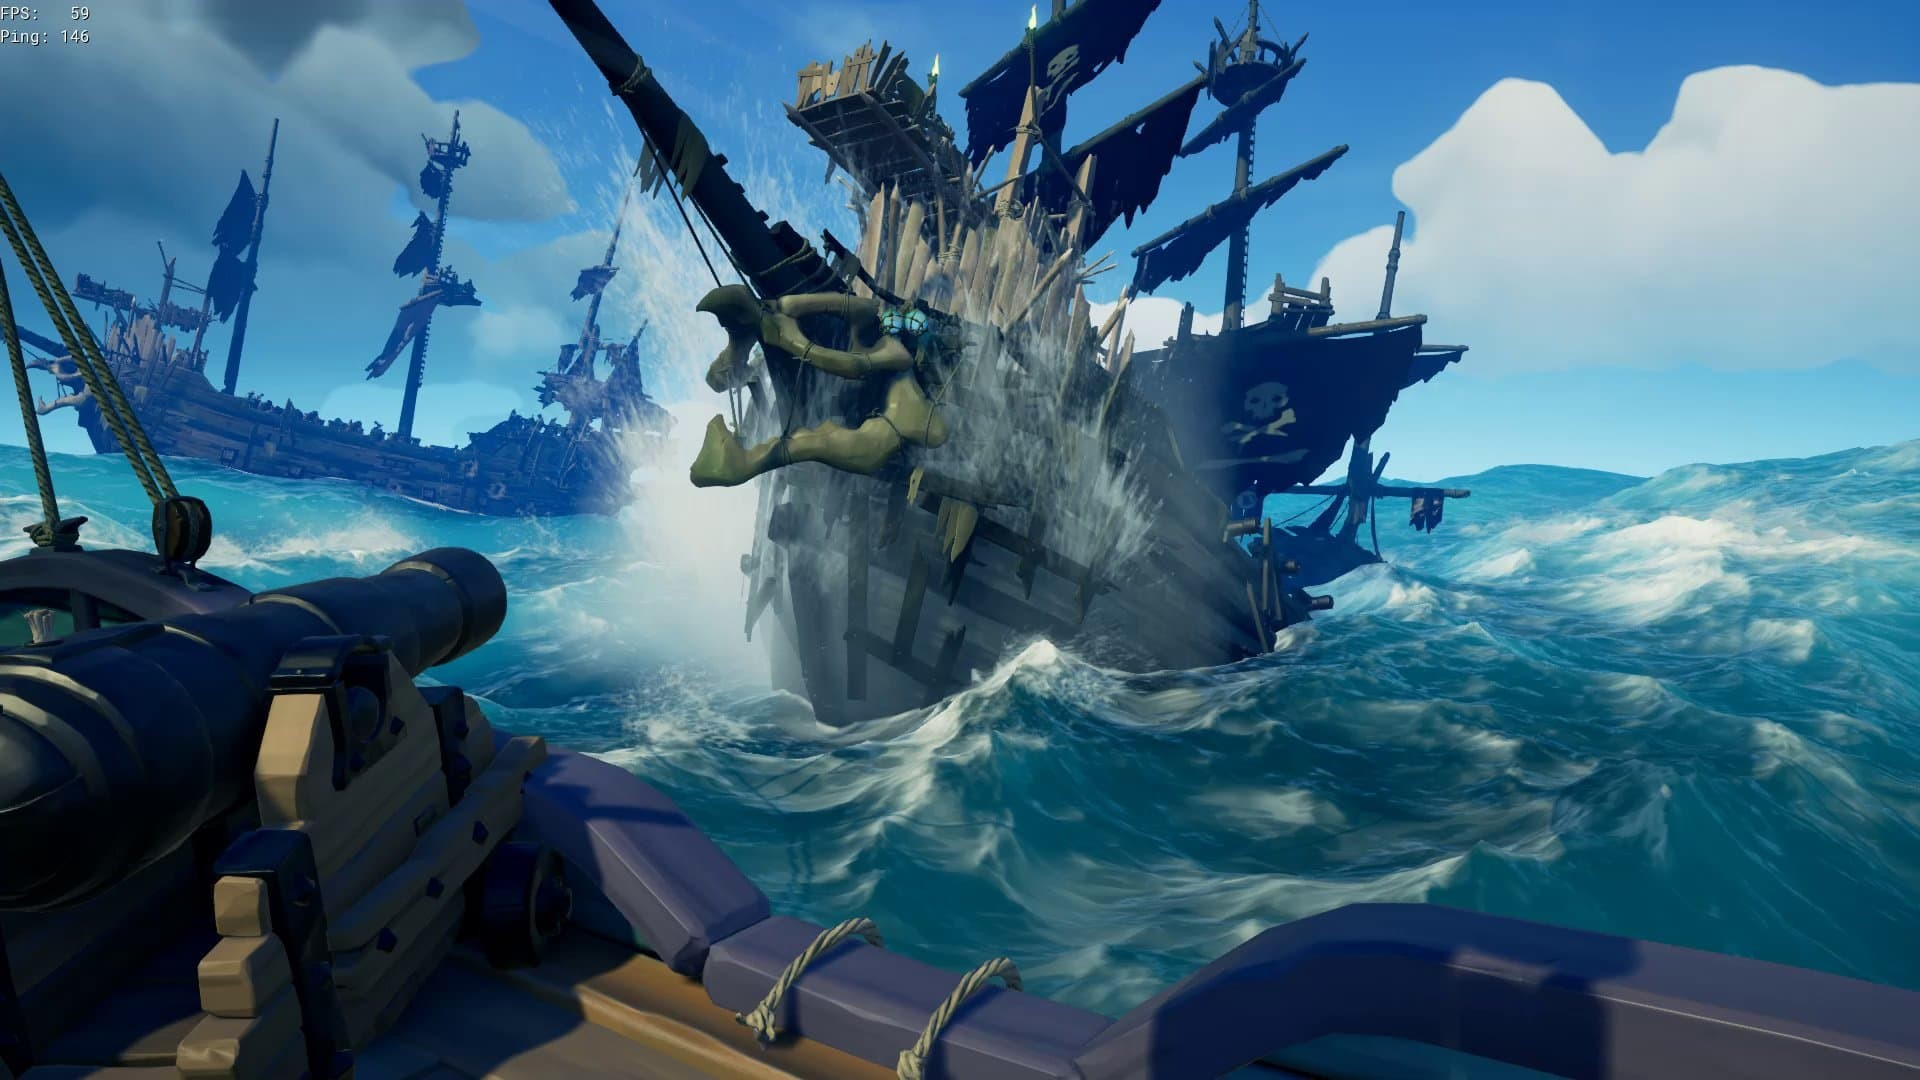 Sea of thieves cursed sails screenshot